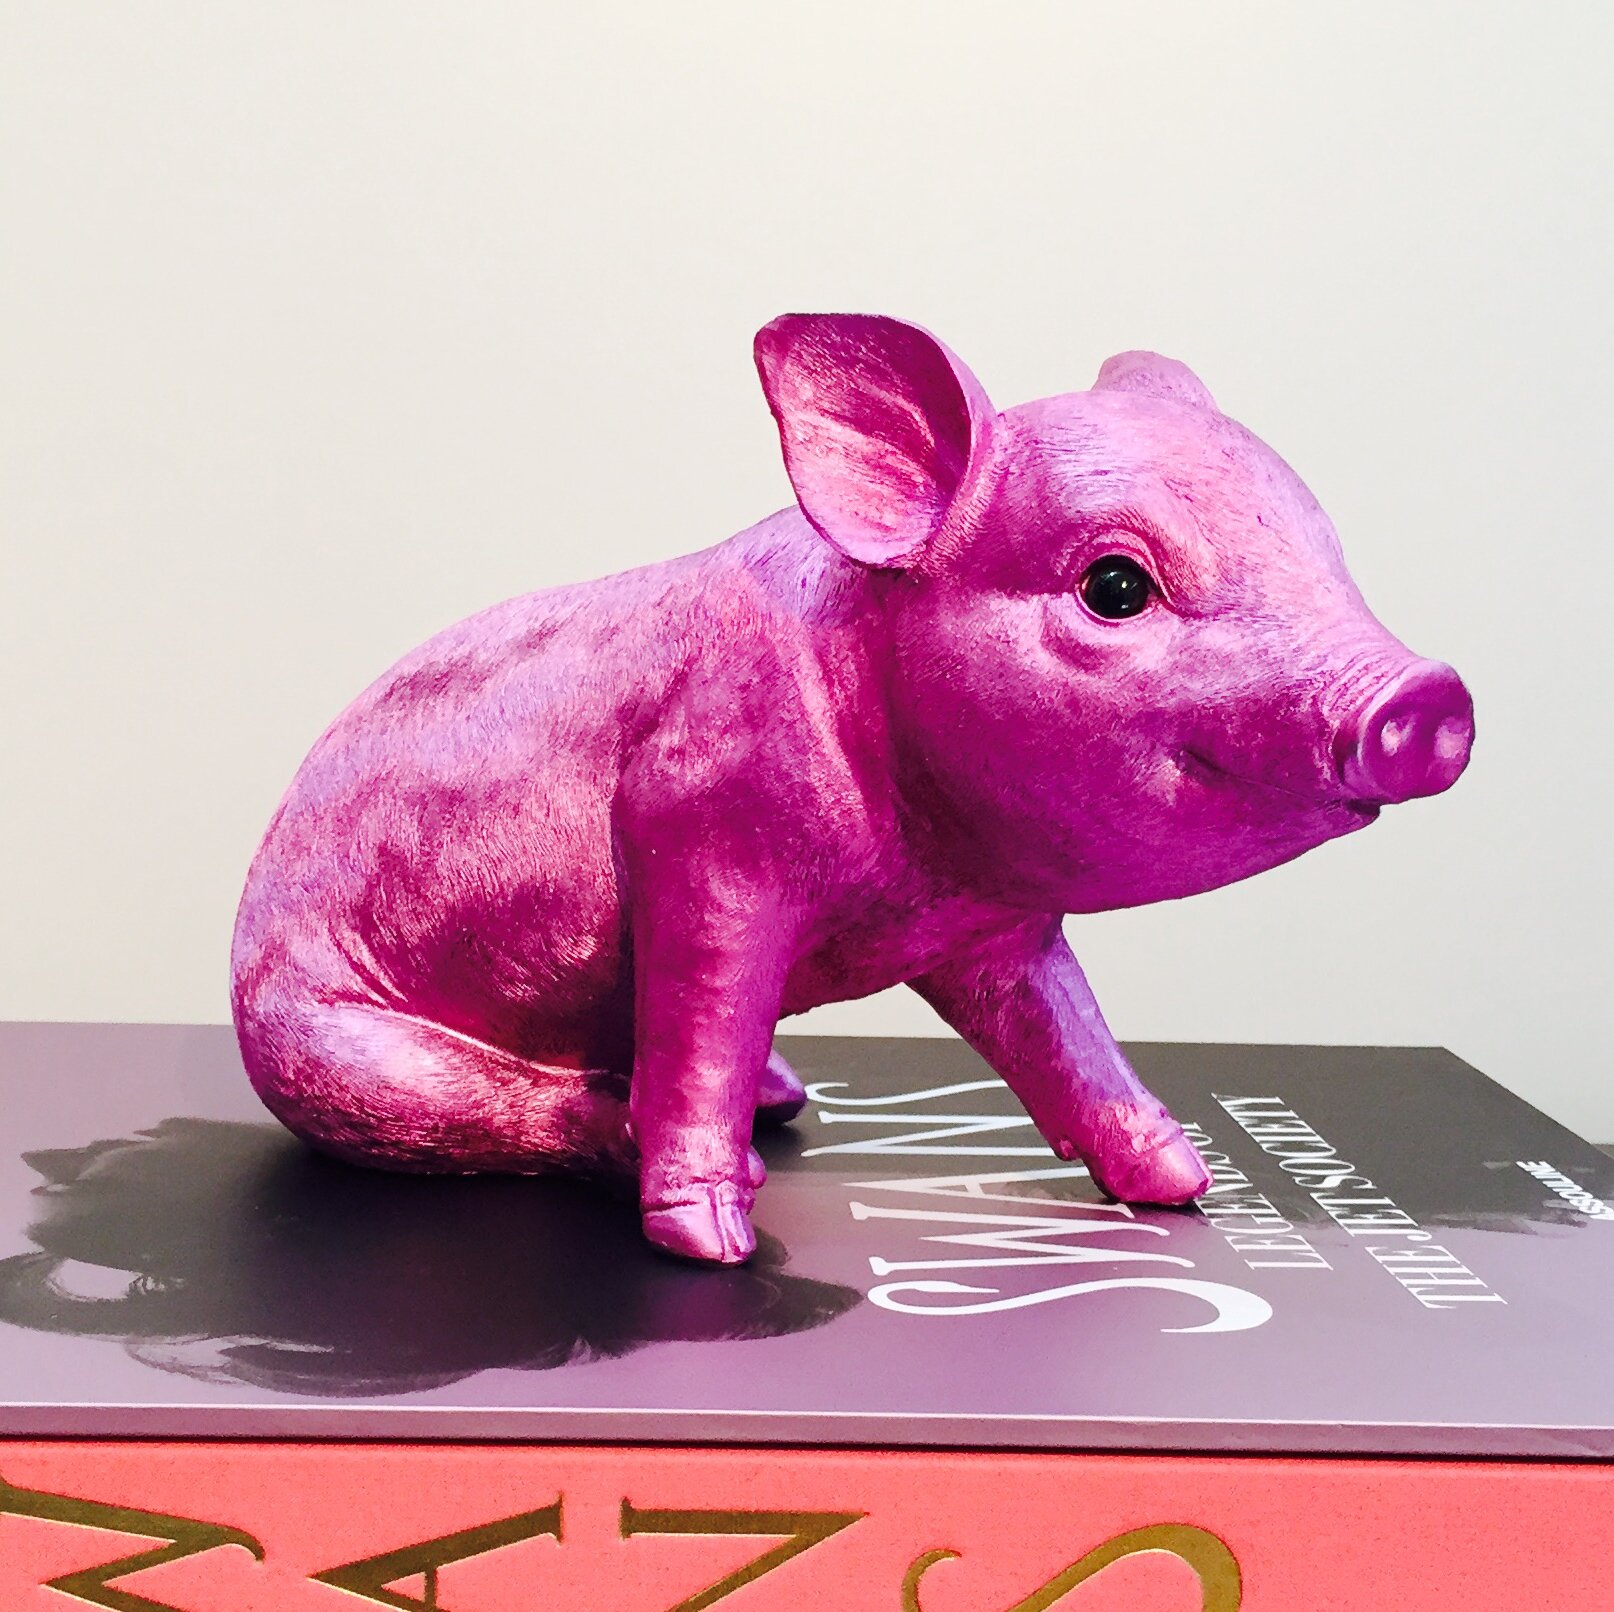 4.9 Black Cat Ceramic Coin Piggy Bank Room Decor